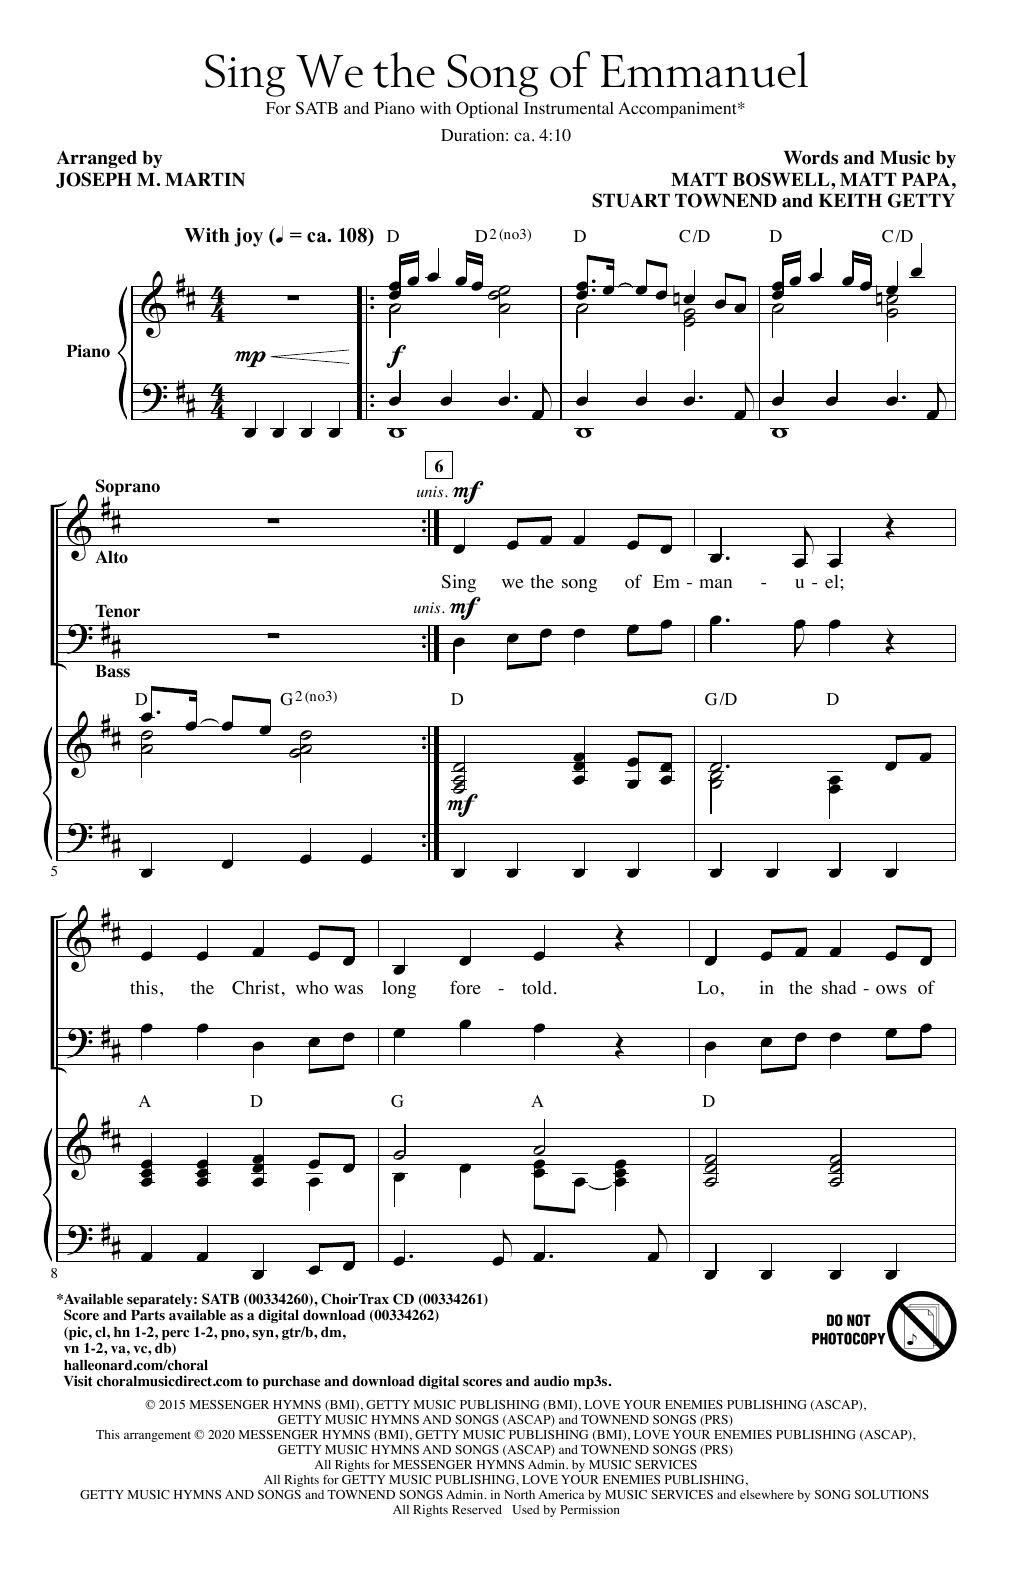 Sing We The Song Of Emmanuel (arr. Joseph M. Martin) (SATB Choir)